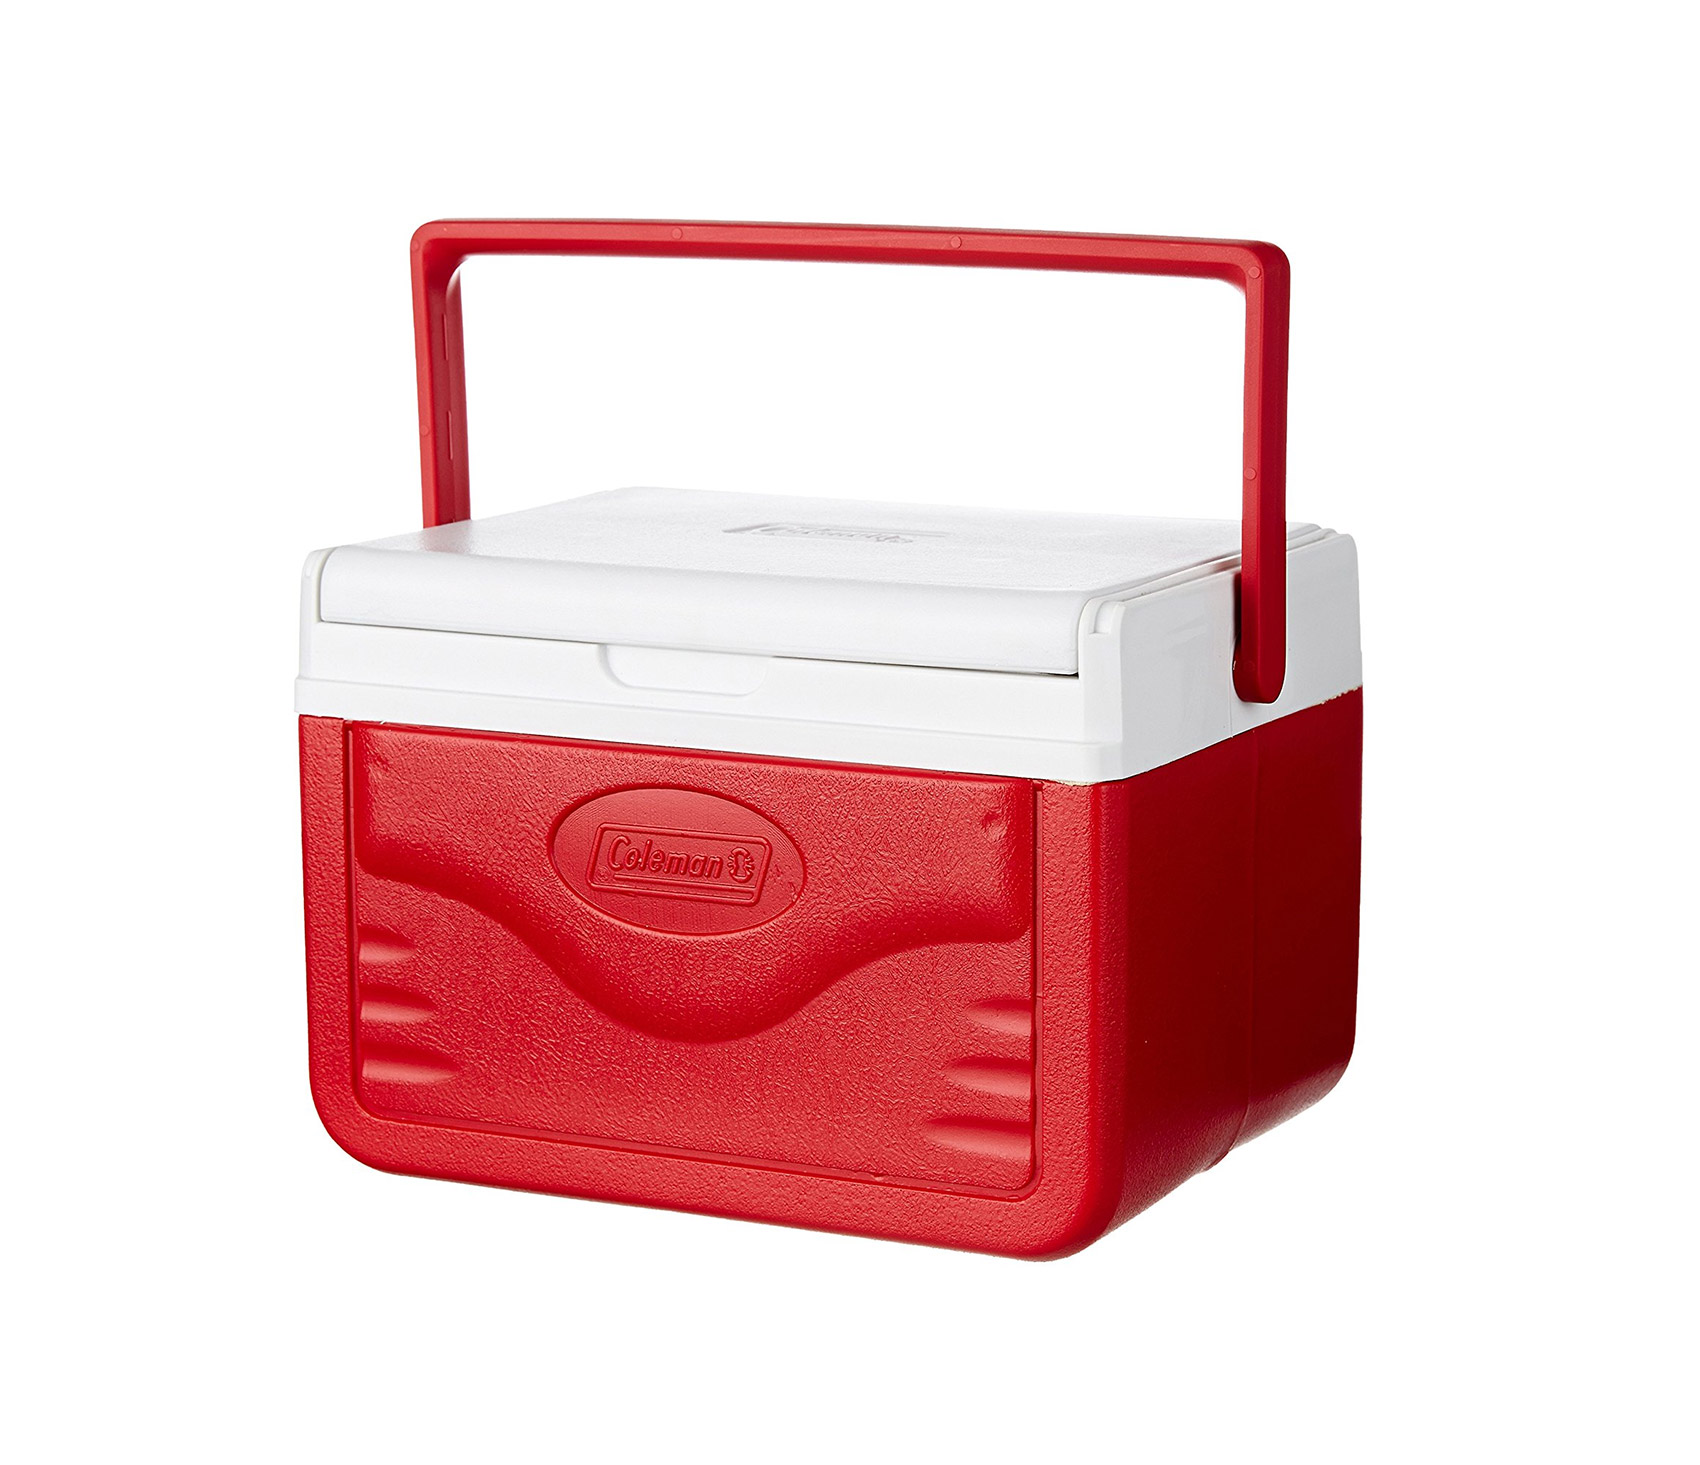 Get A Free Coleman 5-Quart Cooler!